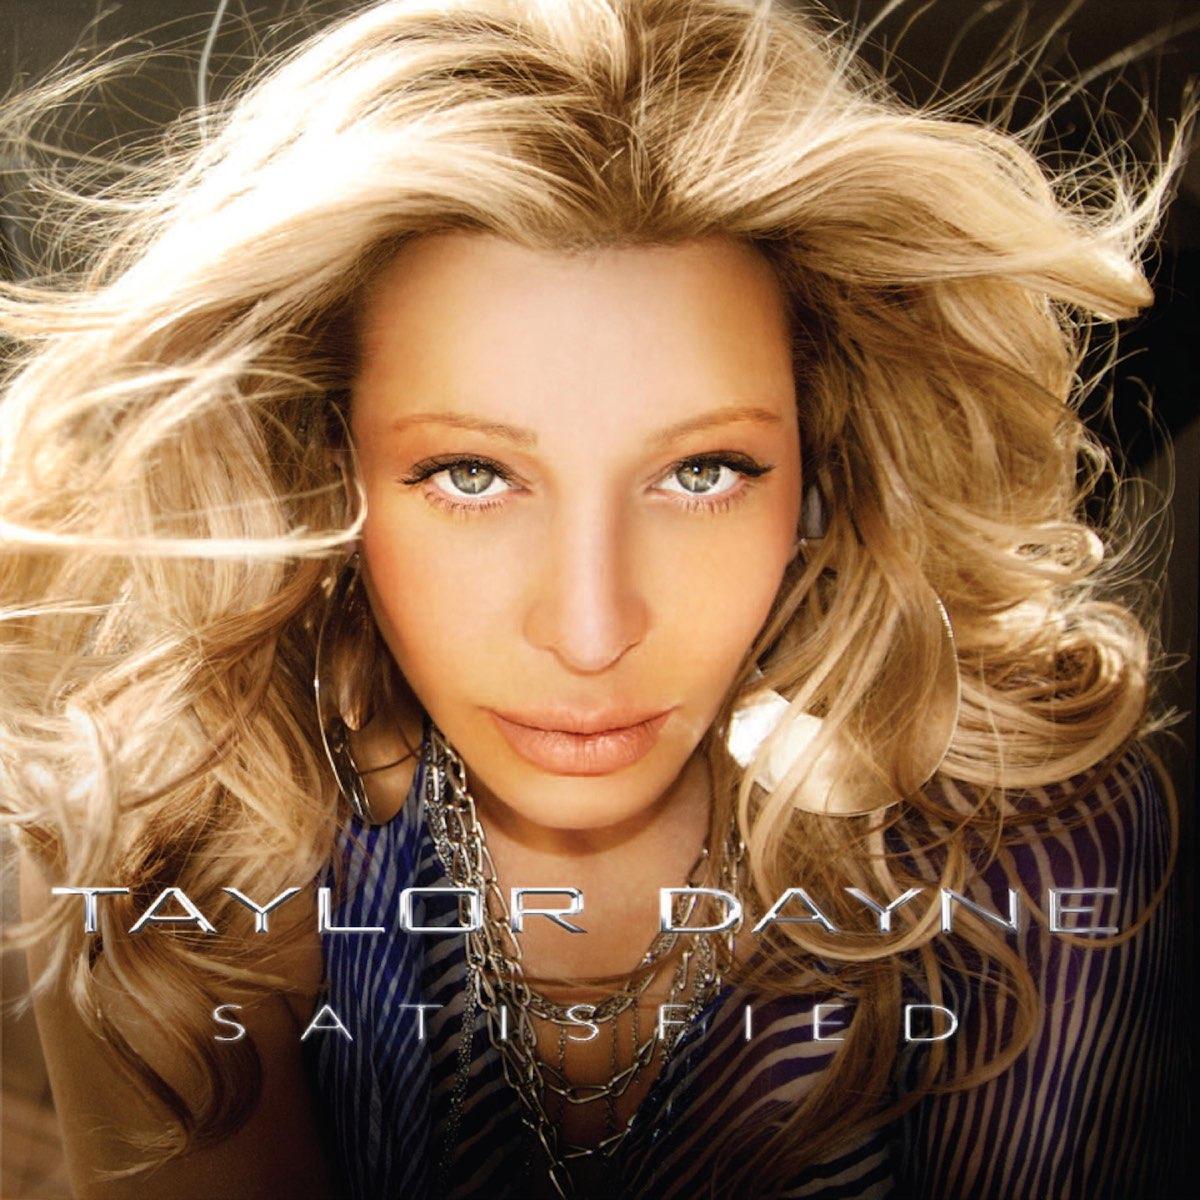 Taylor Dayne, Satisfied